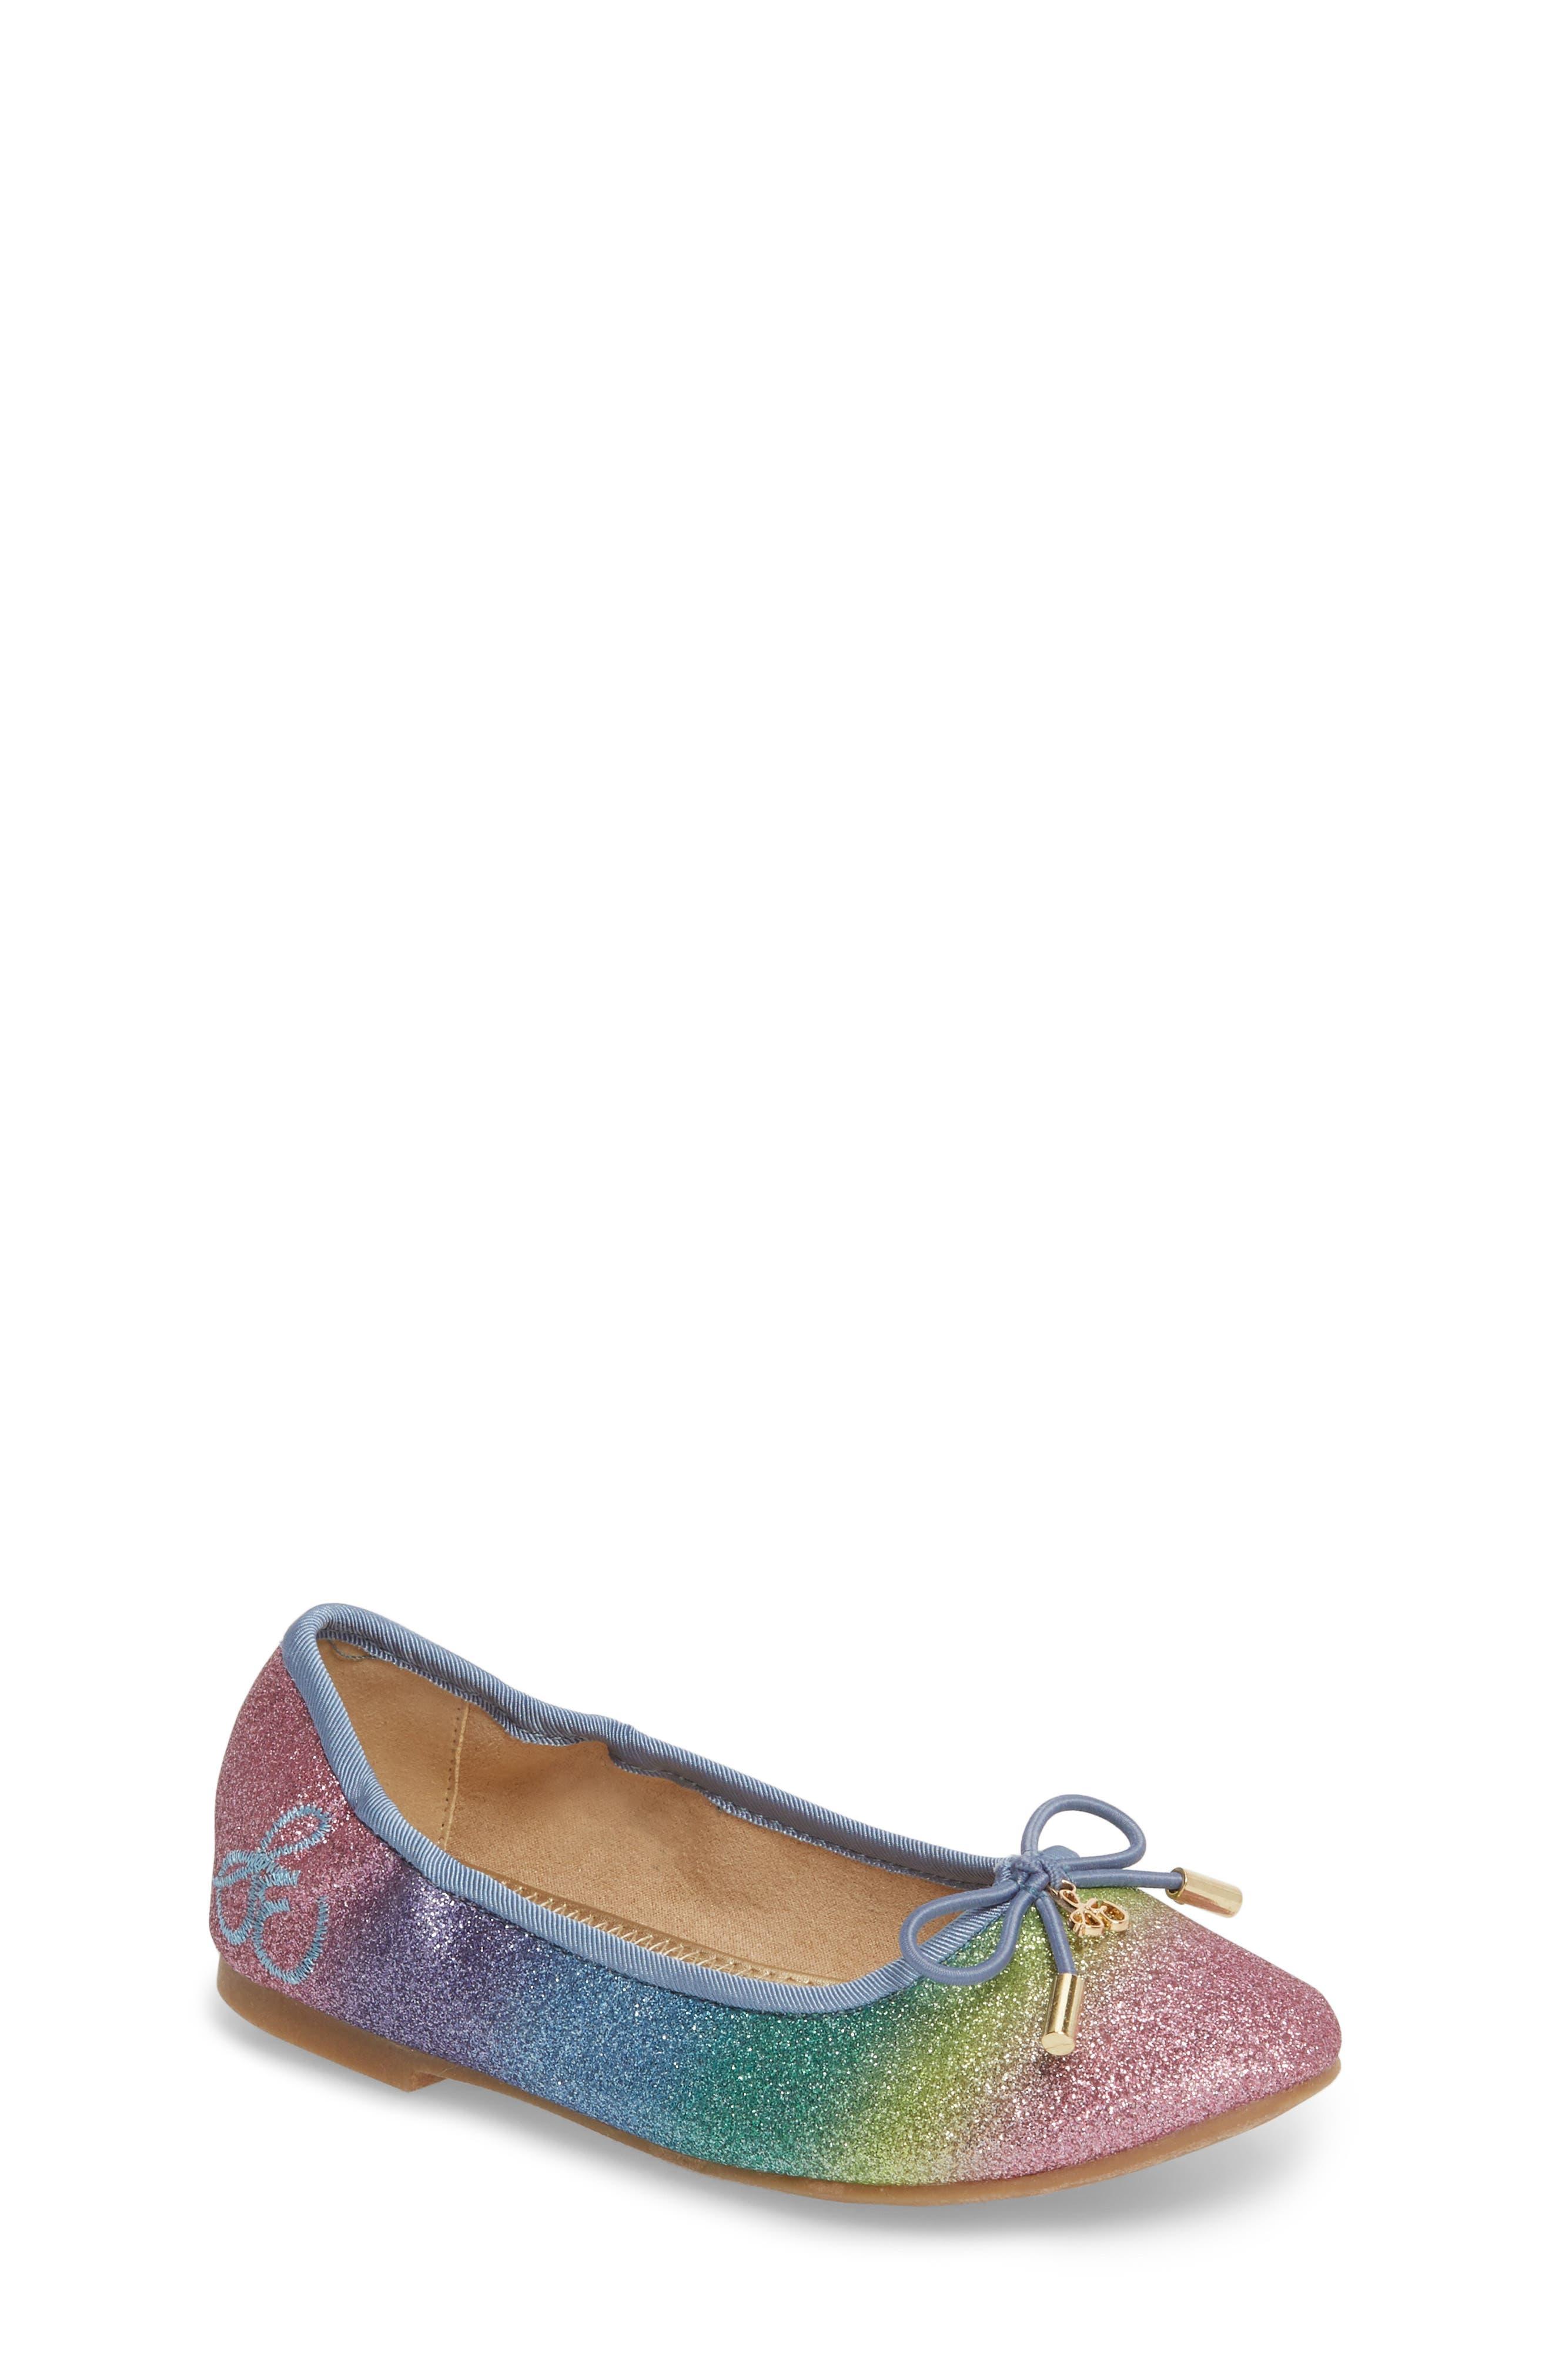 Felicia Glitter Ballet Flat,                             Main thumbnail 1, color,                             RAINBOW OMBRE